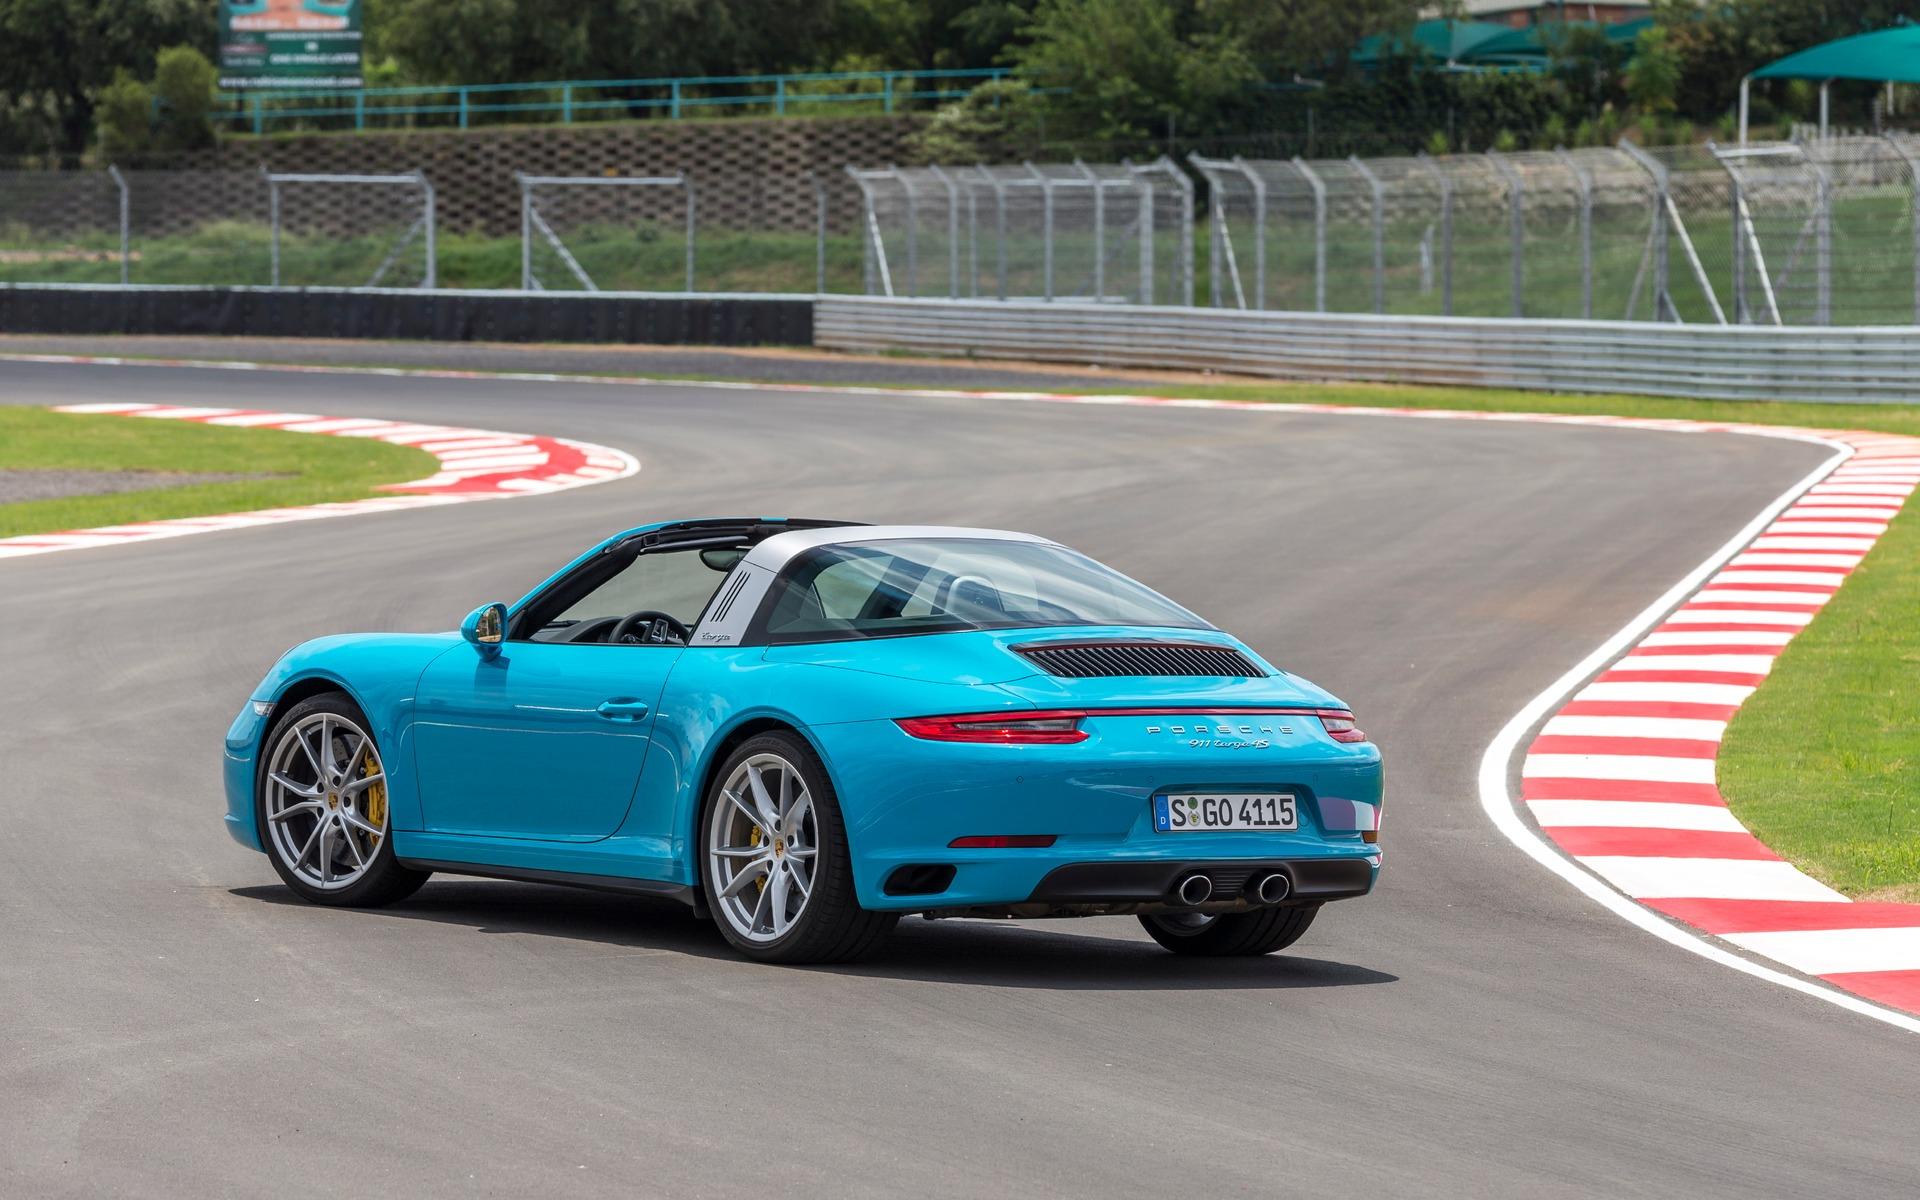 2017 Porsche 911 Carrera 4S, Targa And Turbo S: We're Driving Them on porsche 911 turbo targa, porsche 911 s targa, porsche 991 carrera 4s targa, porsche 911 targa 4s review, porsche 911 targa 4s symbol,